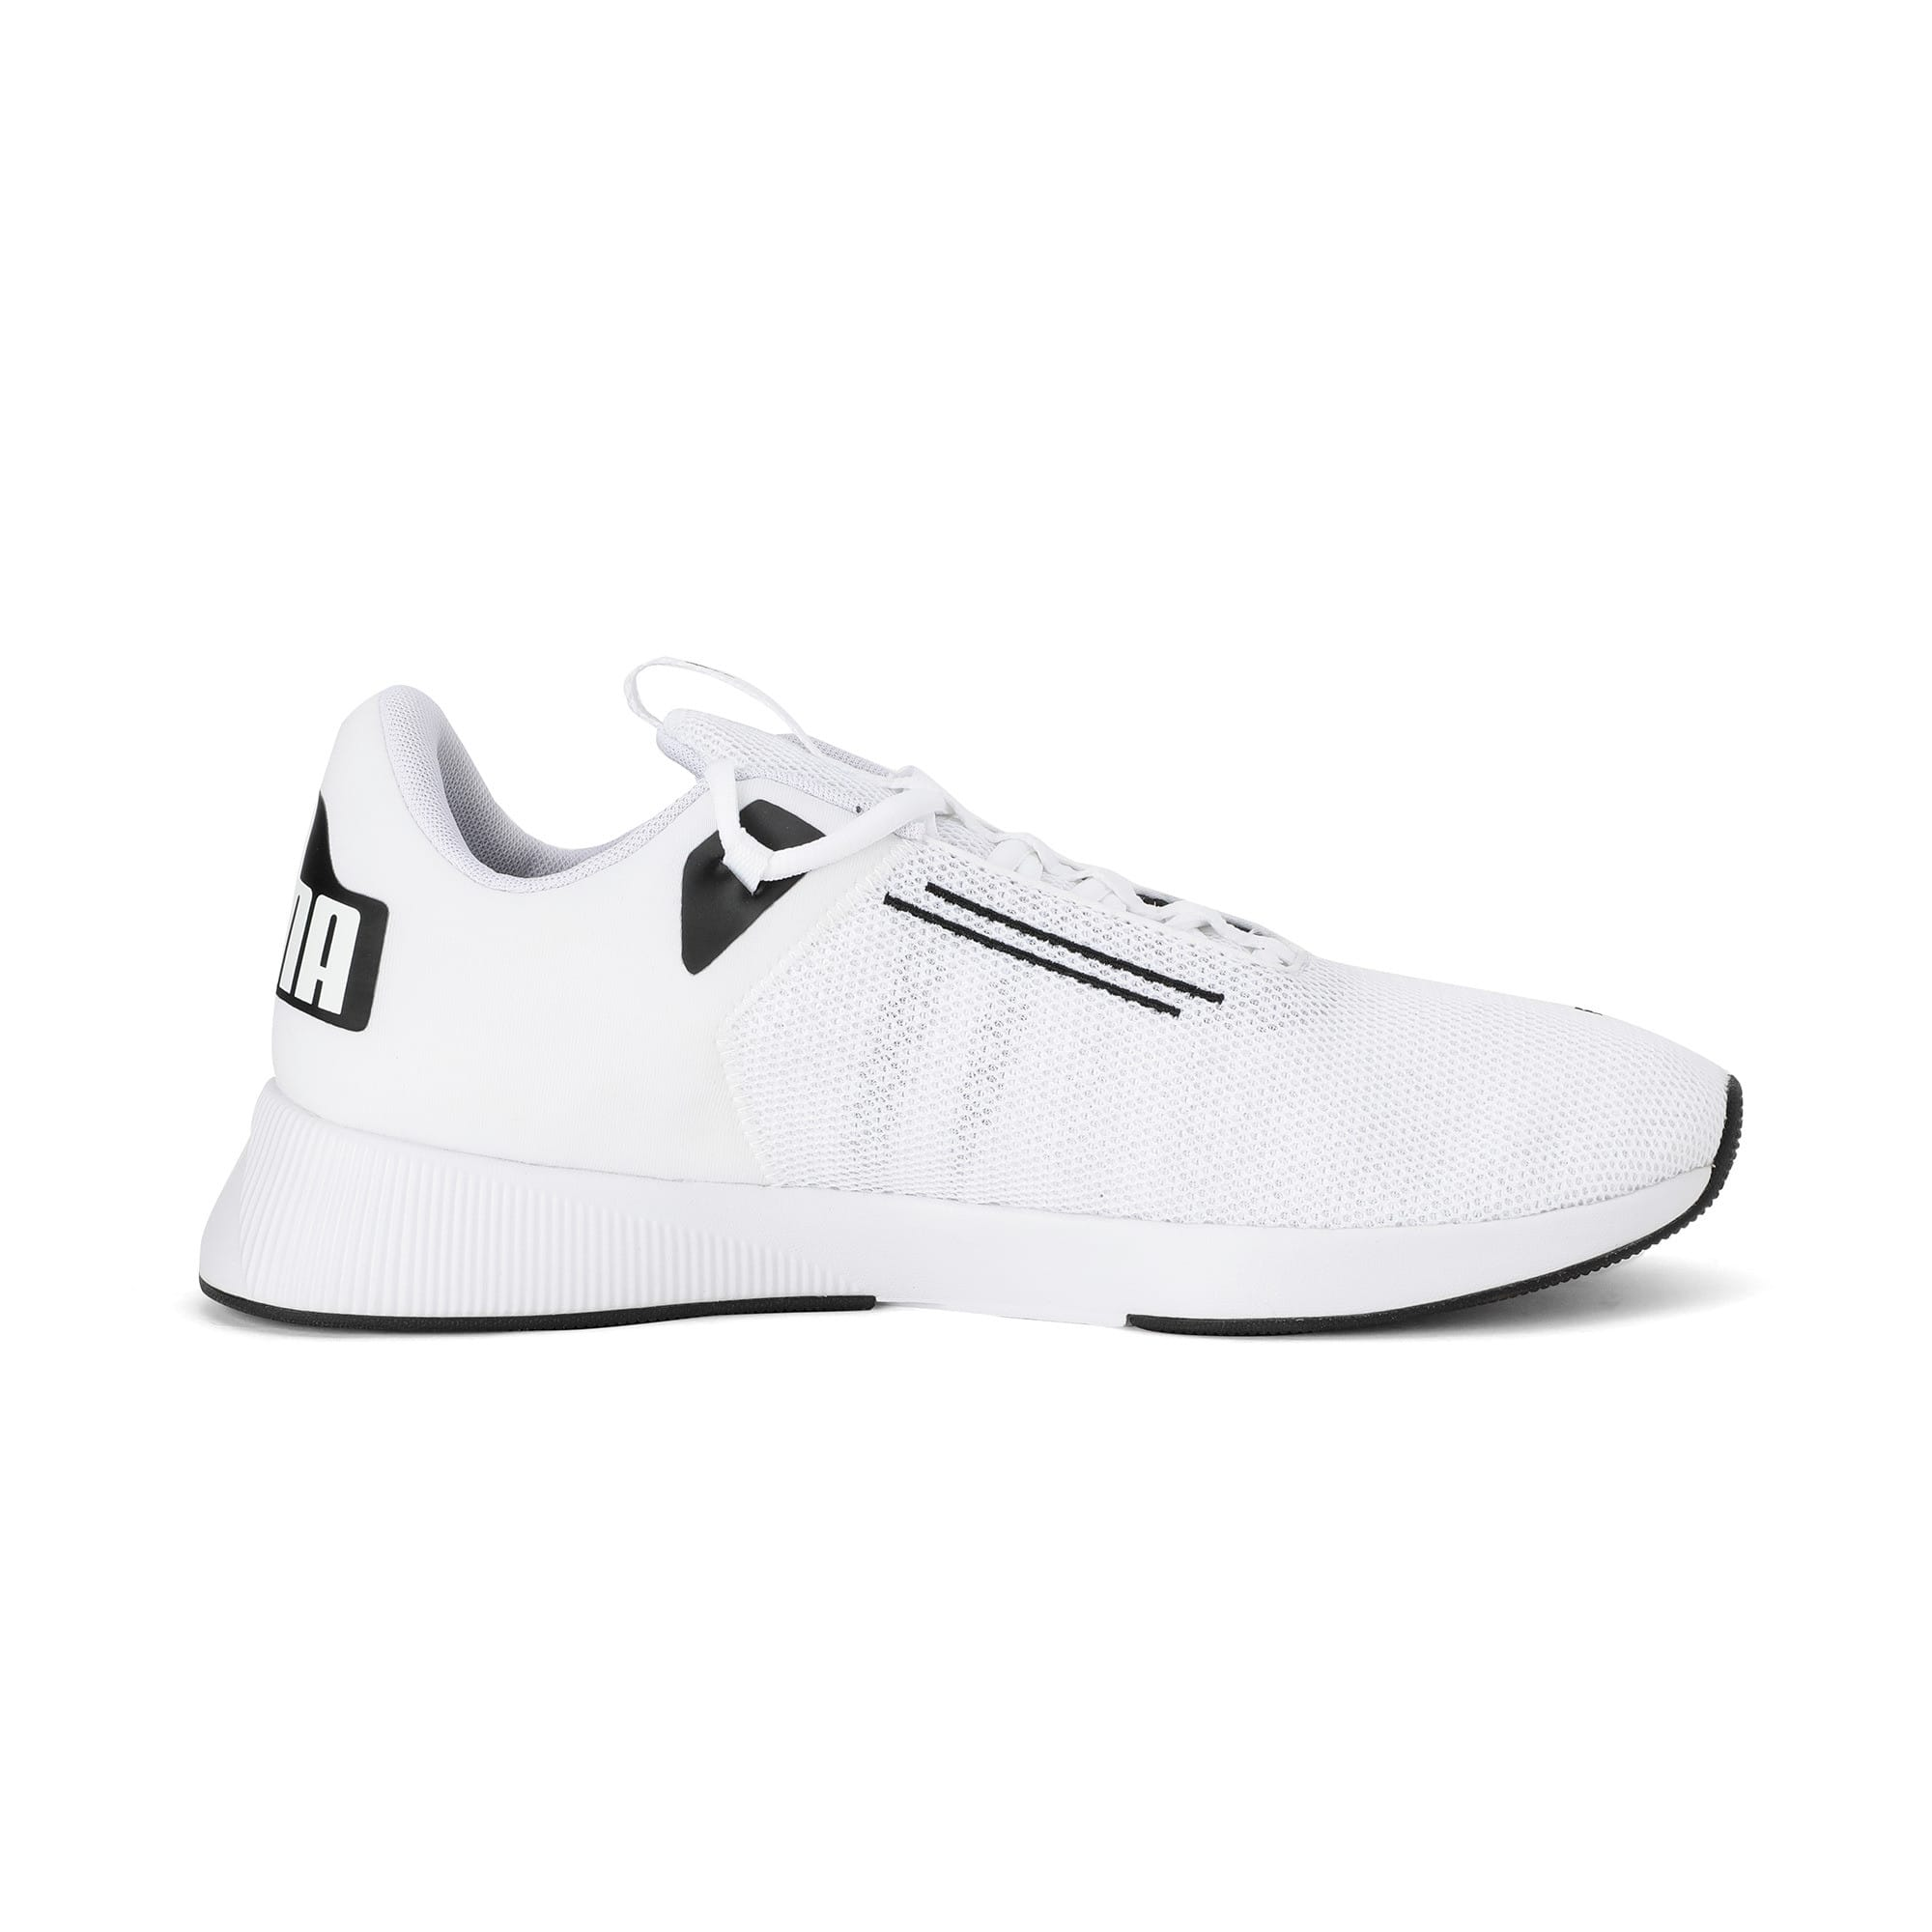 Thumbnail 5 of Flyer Modern Running Shoes, Puma White-Puma Black, medium-IND